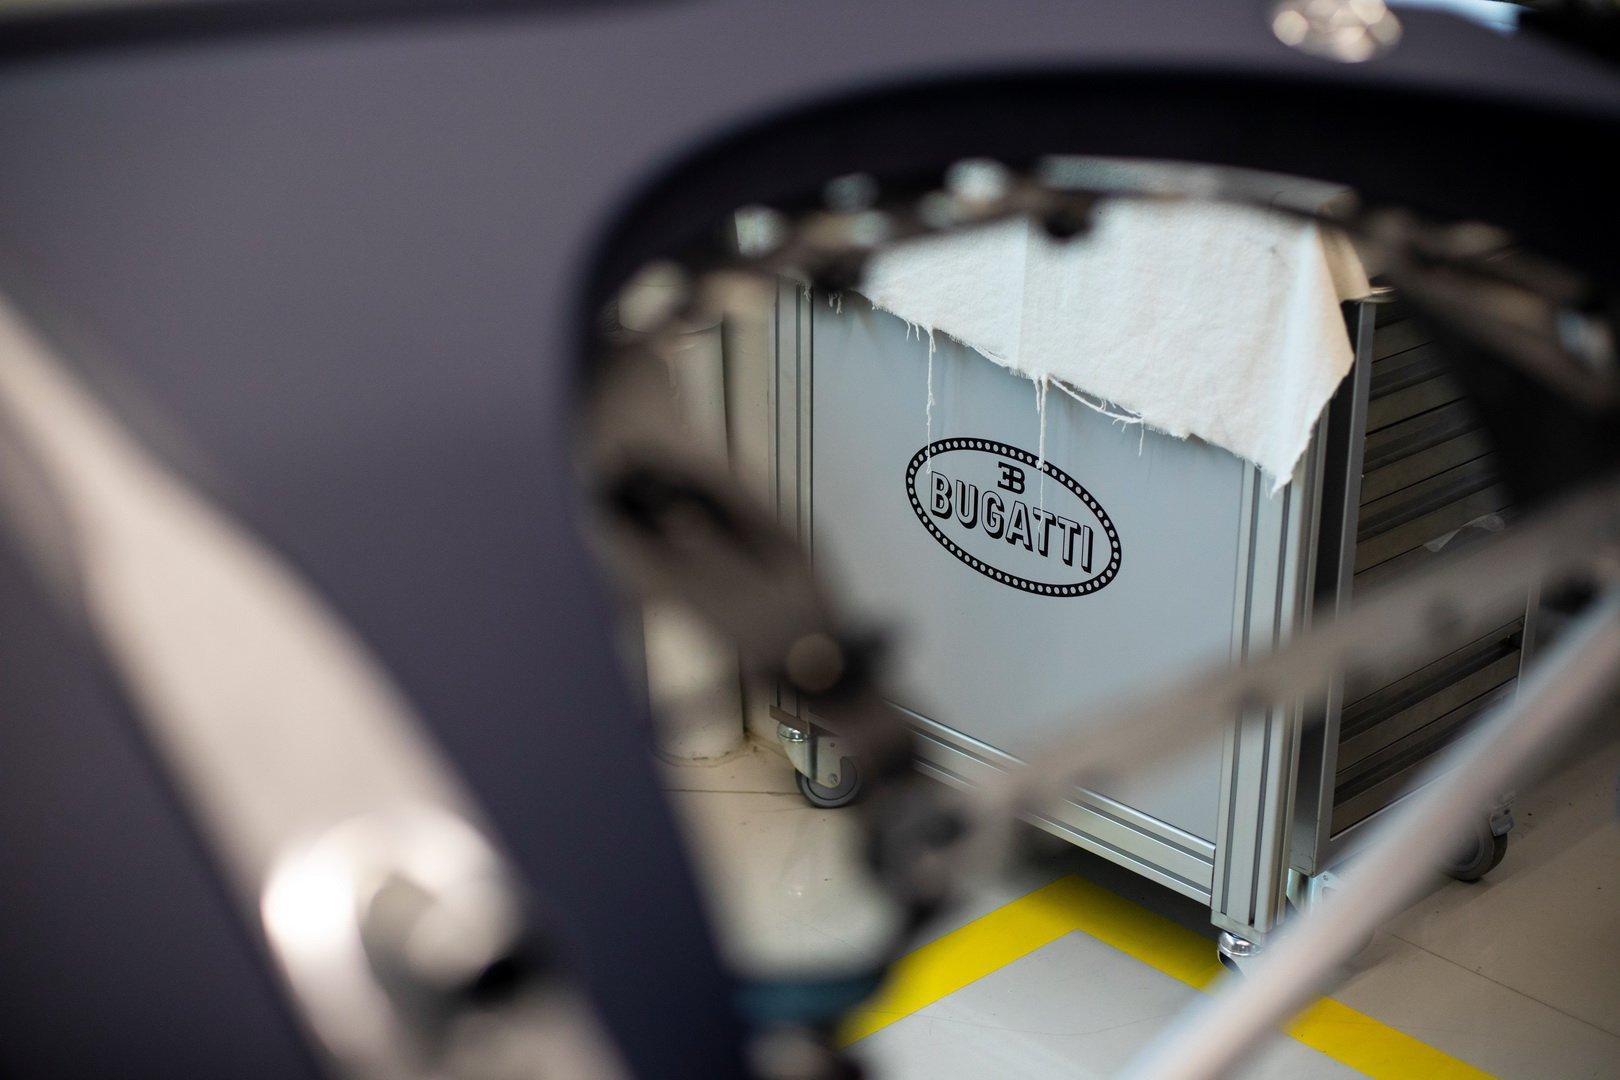 Bugatti-Chiron-Sport-110-Ans-Bugatti-production-plant-20